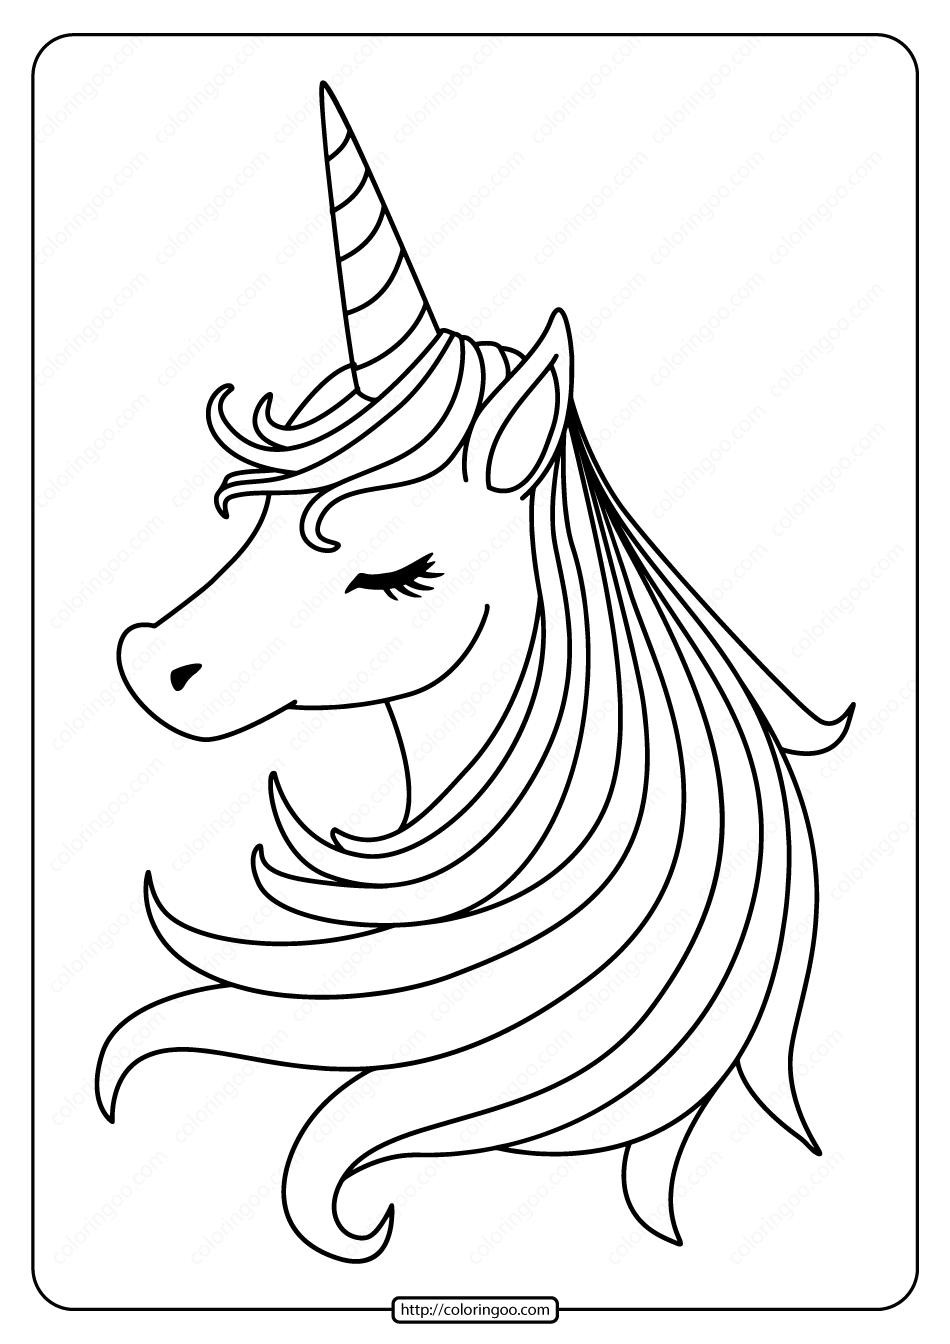 Free Printable Sleeping Unicorn Pdf Coloring Page Puppy Coloring Pages Unicorn Coloring Pages Kids Colouring Printables